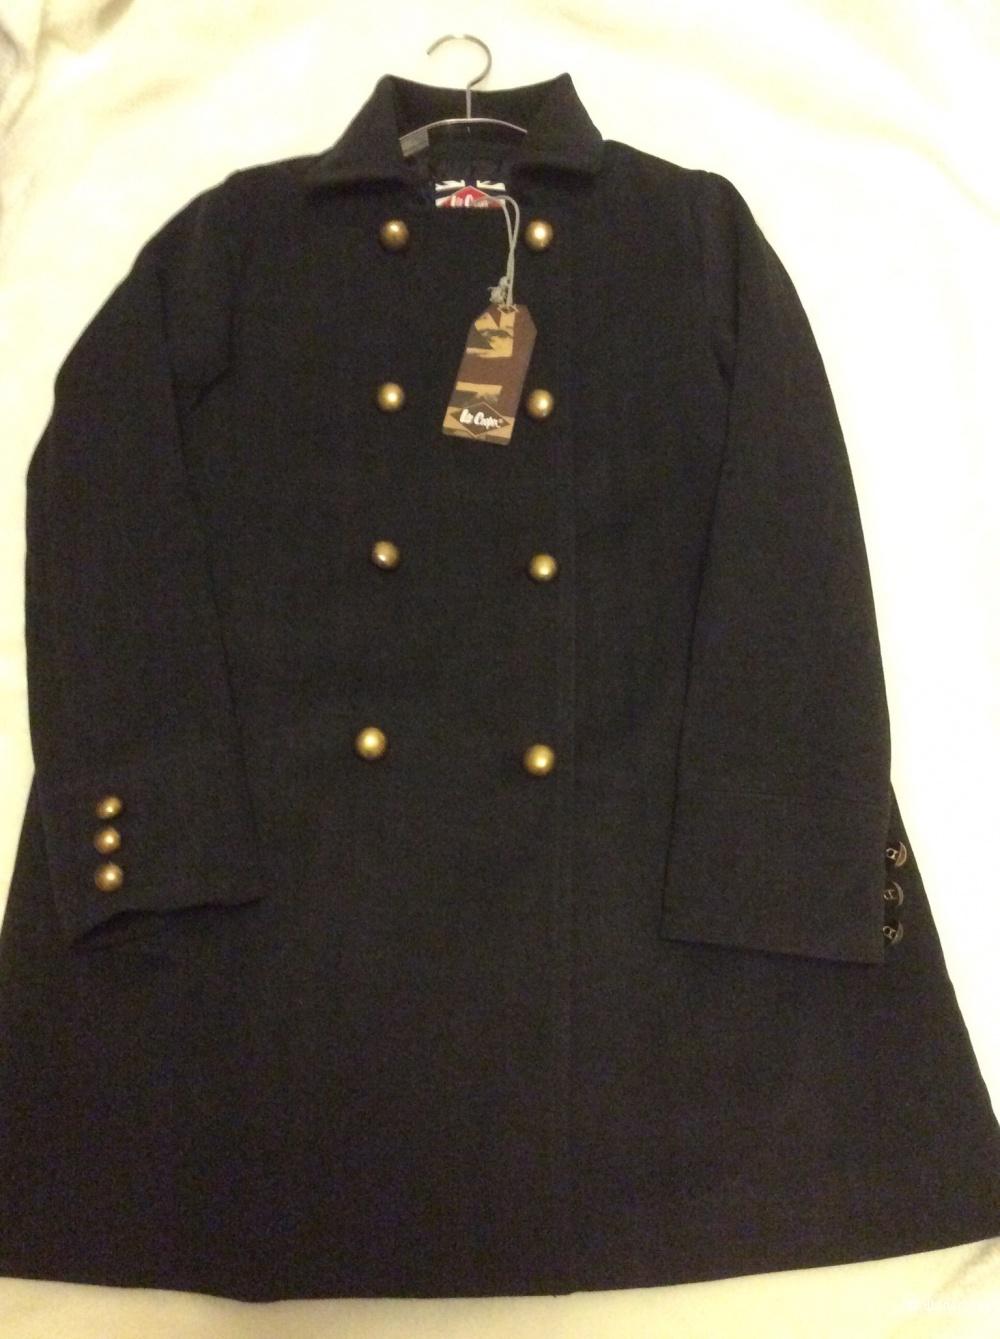 Пальто Lee Cooper, весна-осень, размер М.